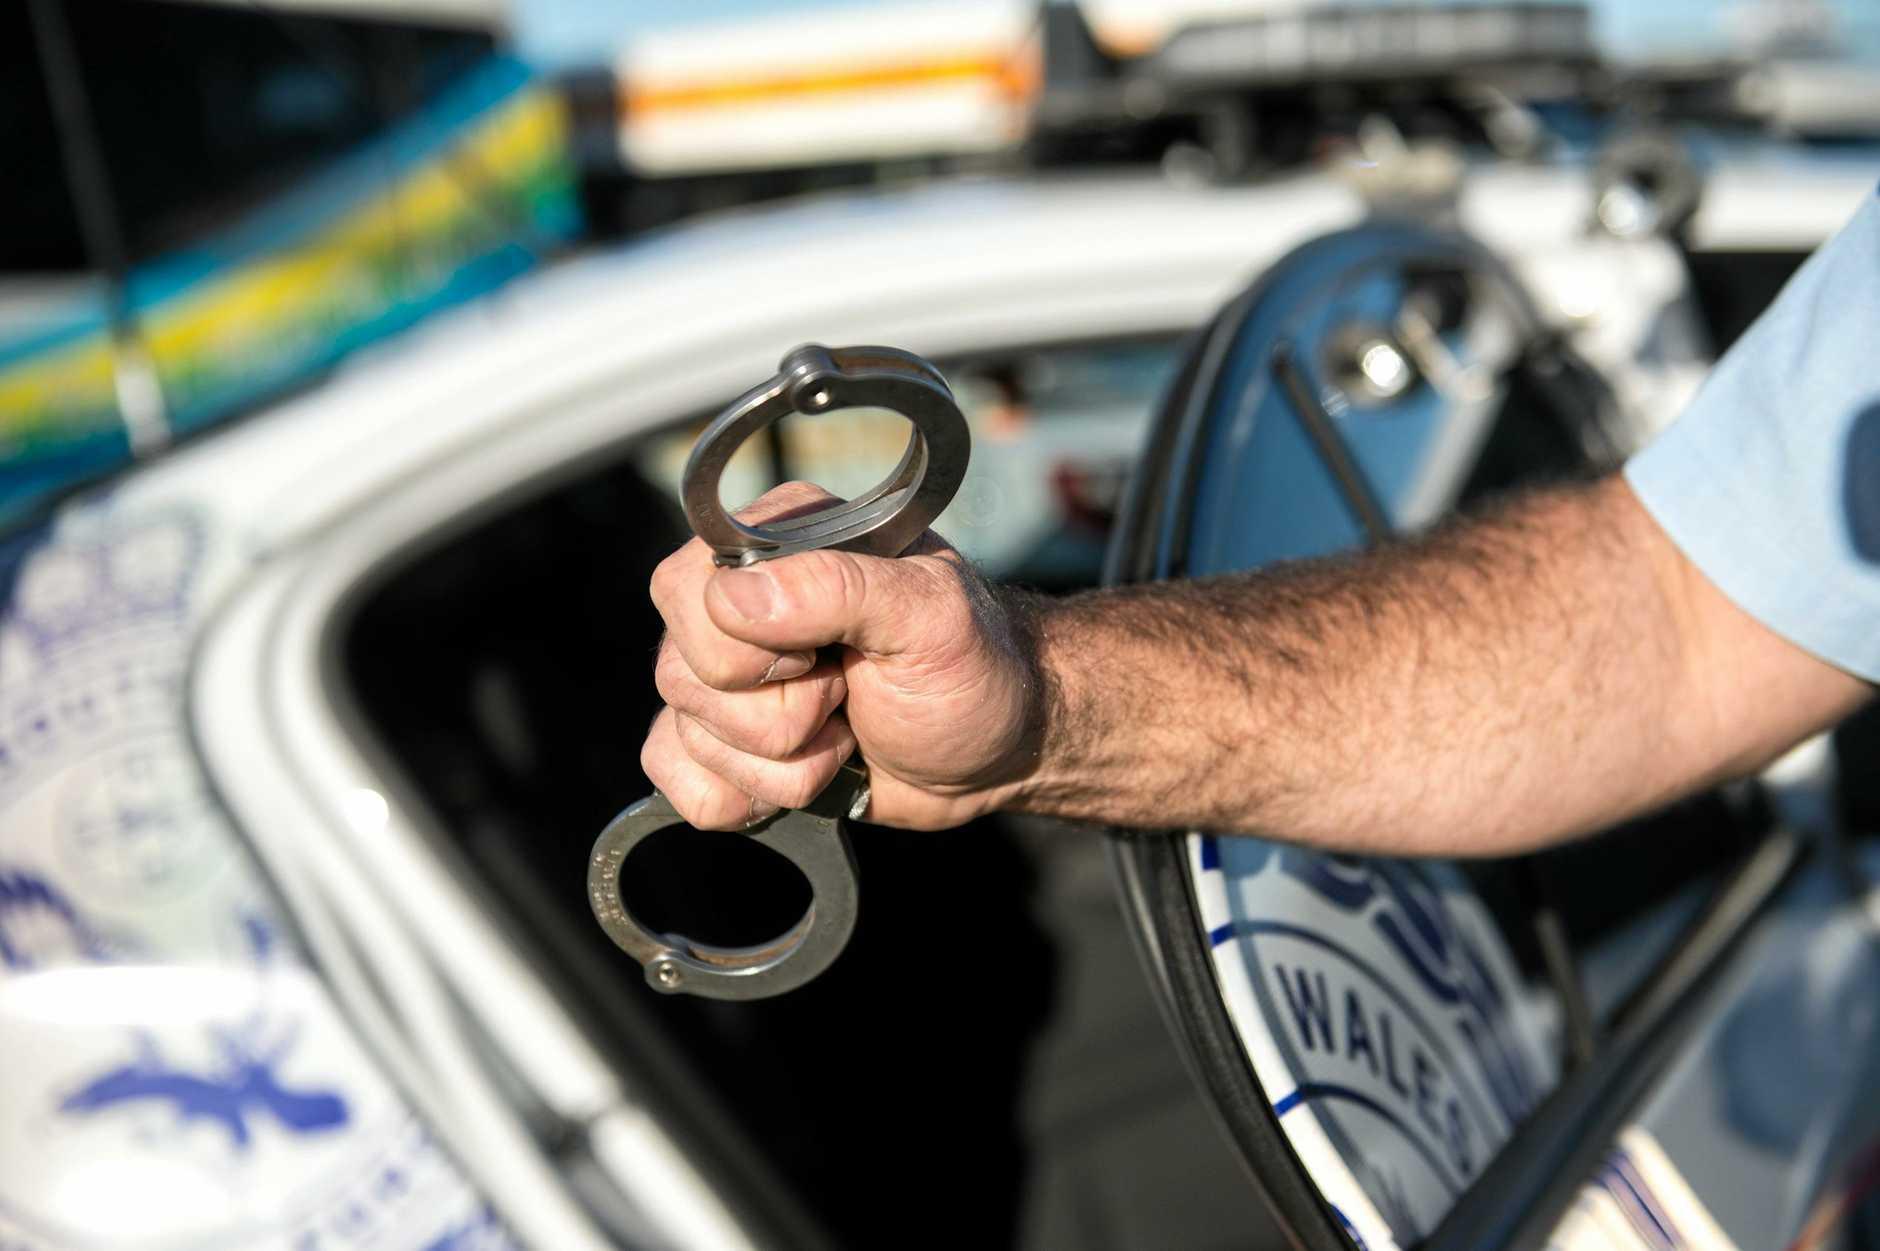 A man will face court next month following drink driving arrest